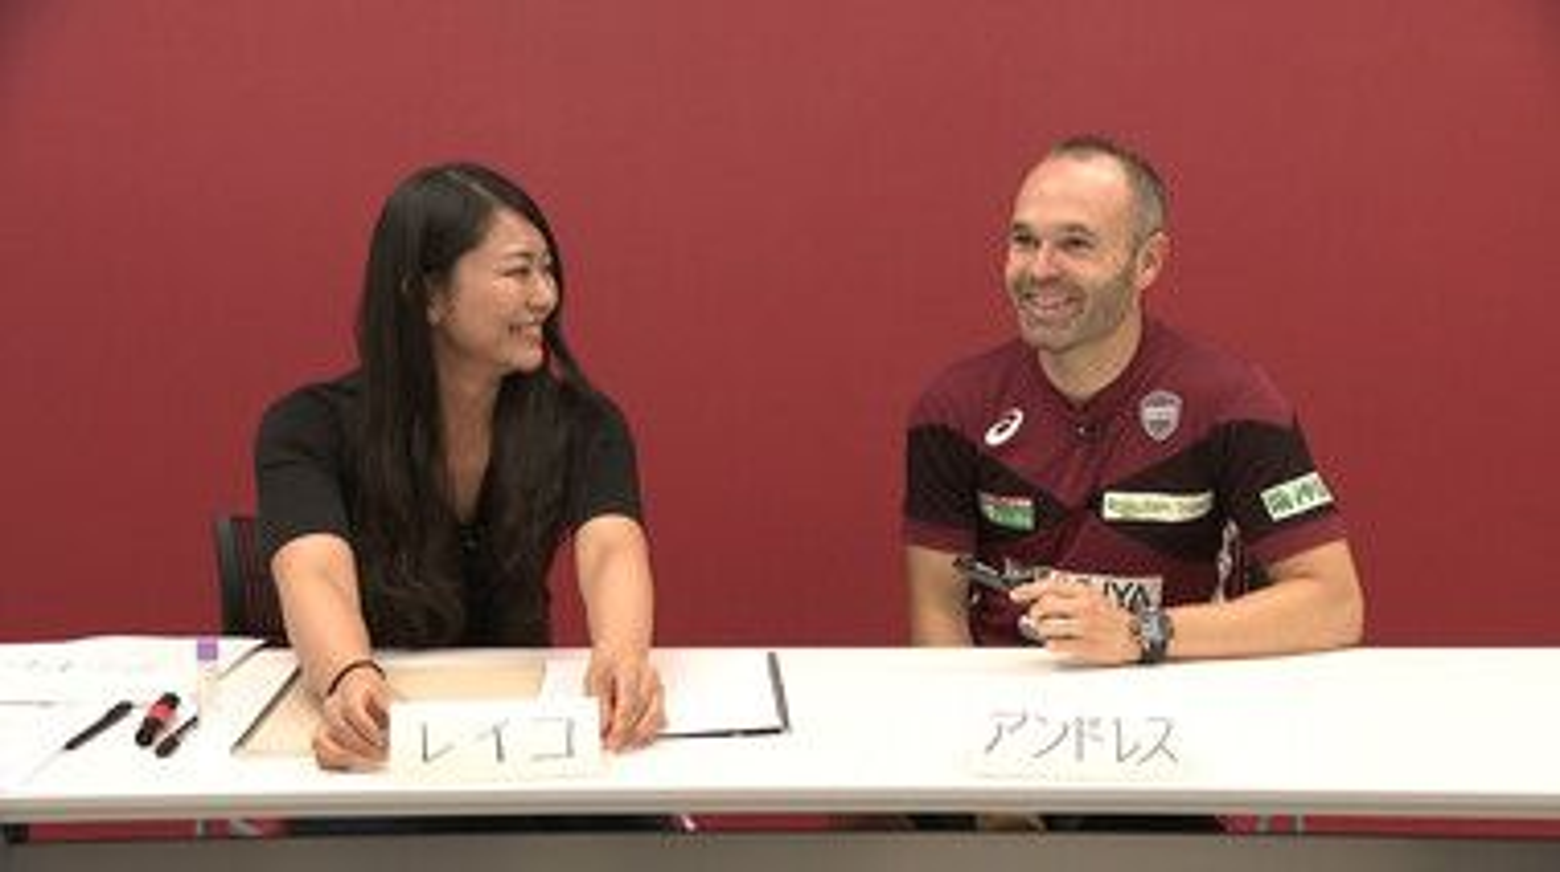 Iniesta TV: Discover Japan 第 5集: Discover Japan #4 Kanji Lesson 2